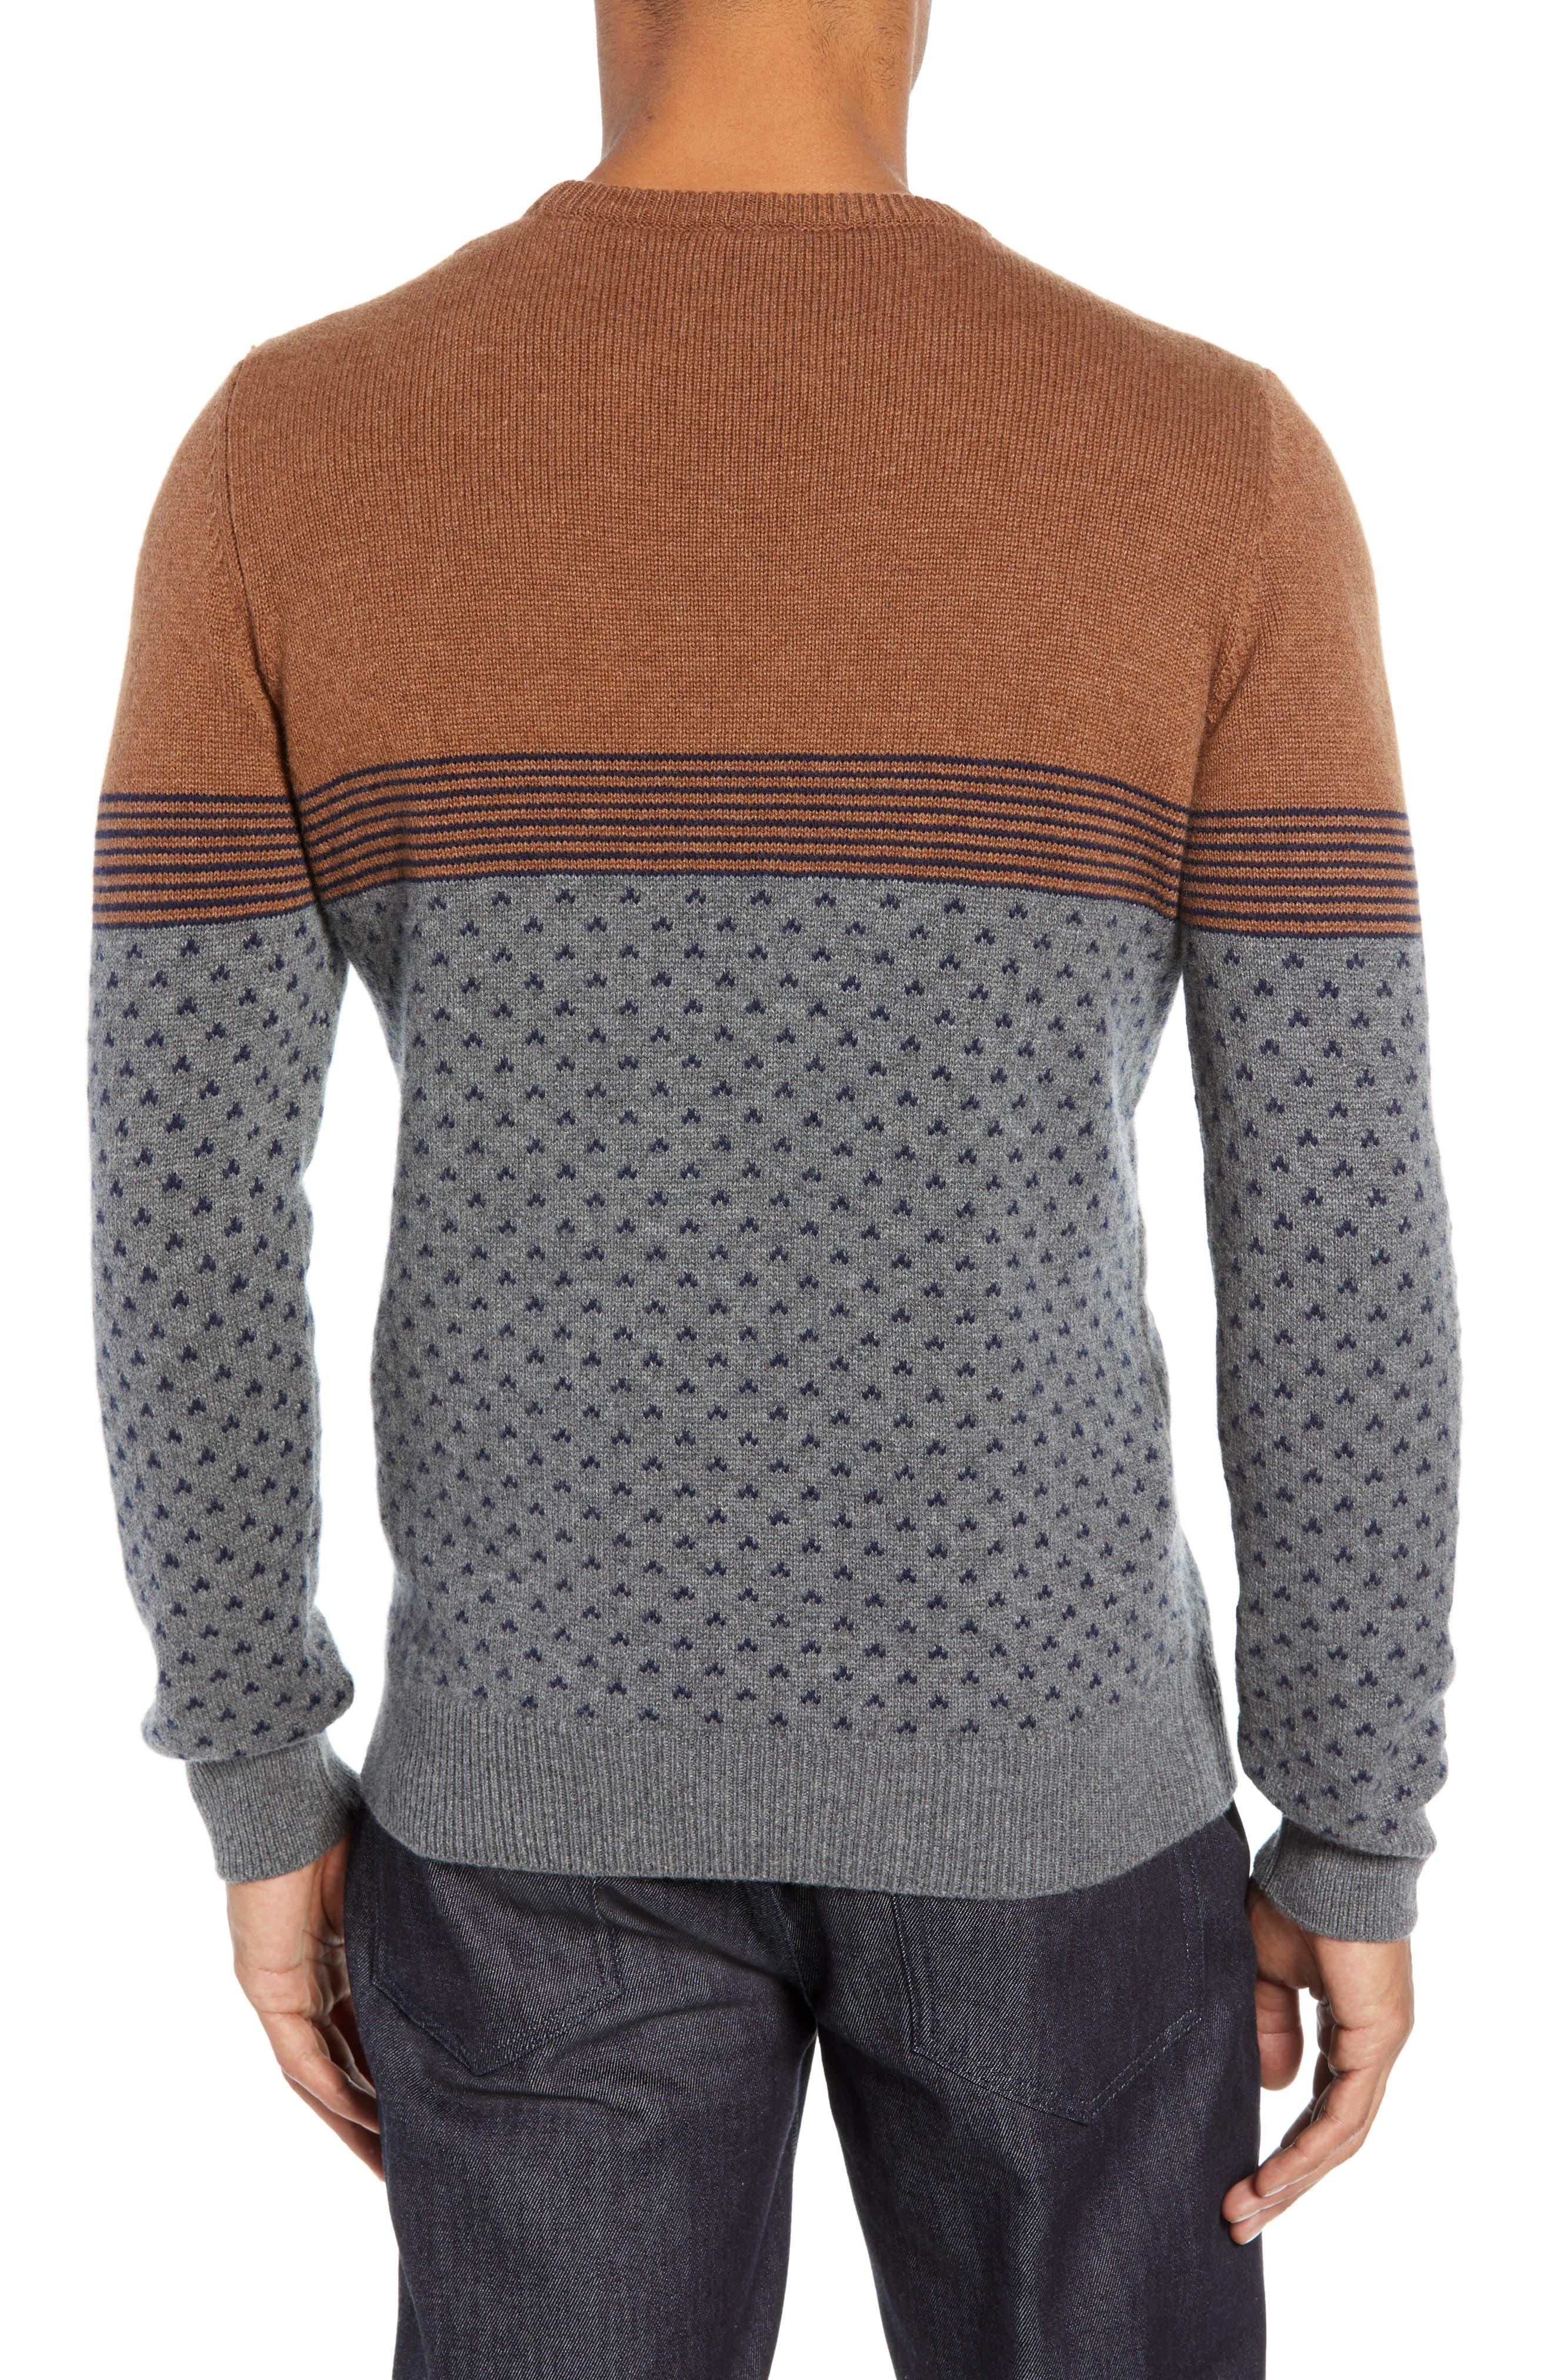 Trim Fit Cashmere Sweater,                             Alternate thumbnail 2, color,                             GREY